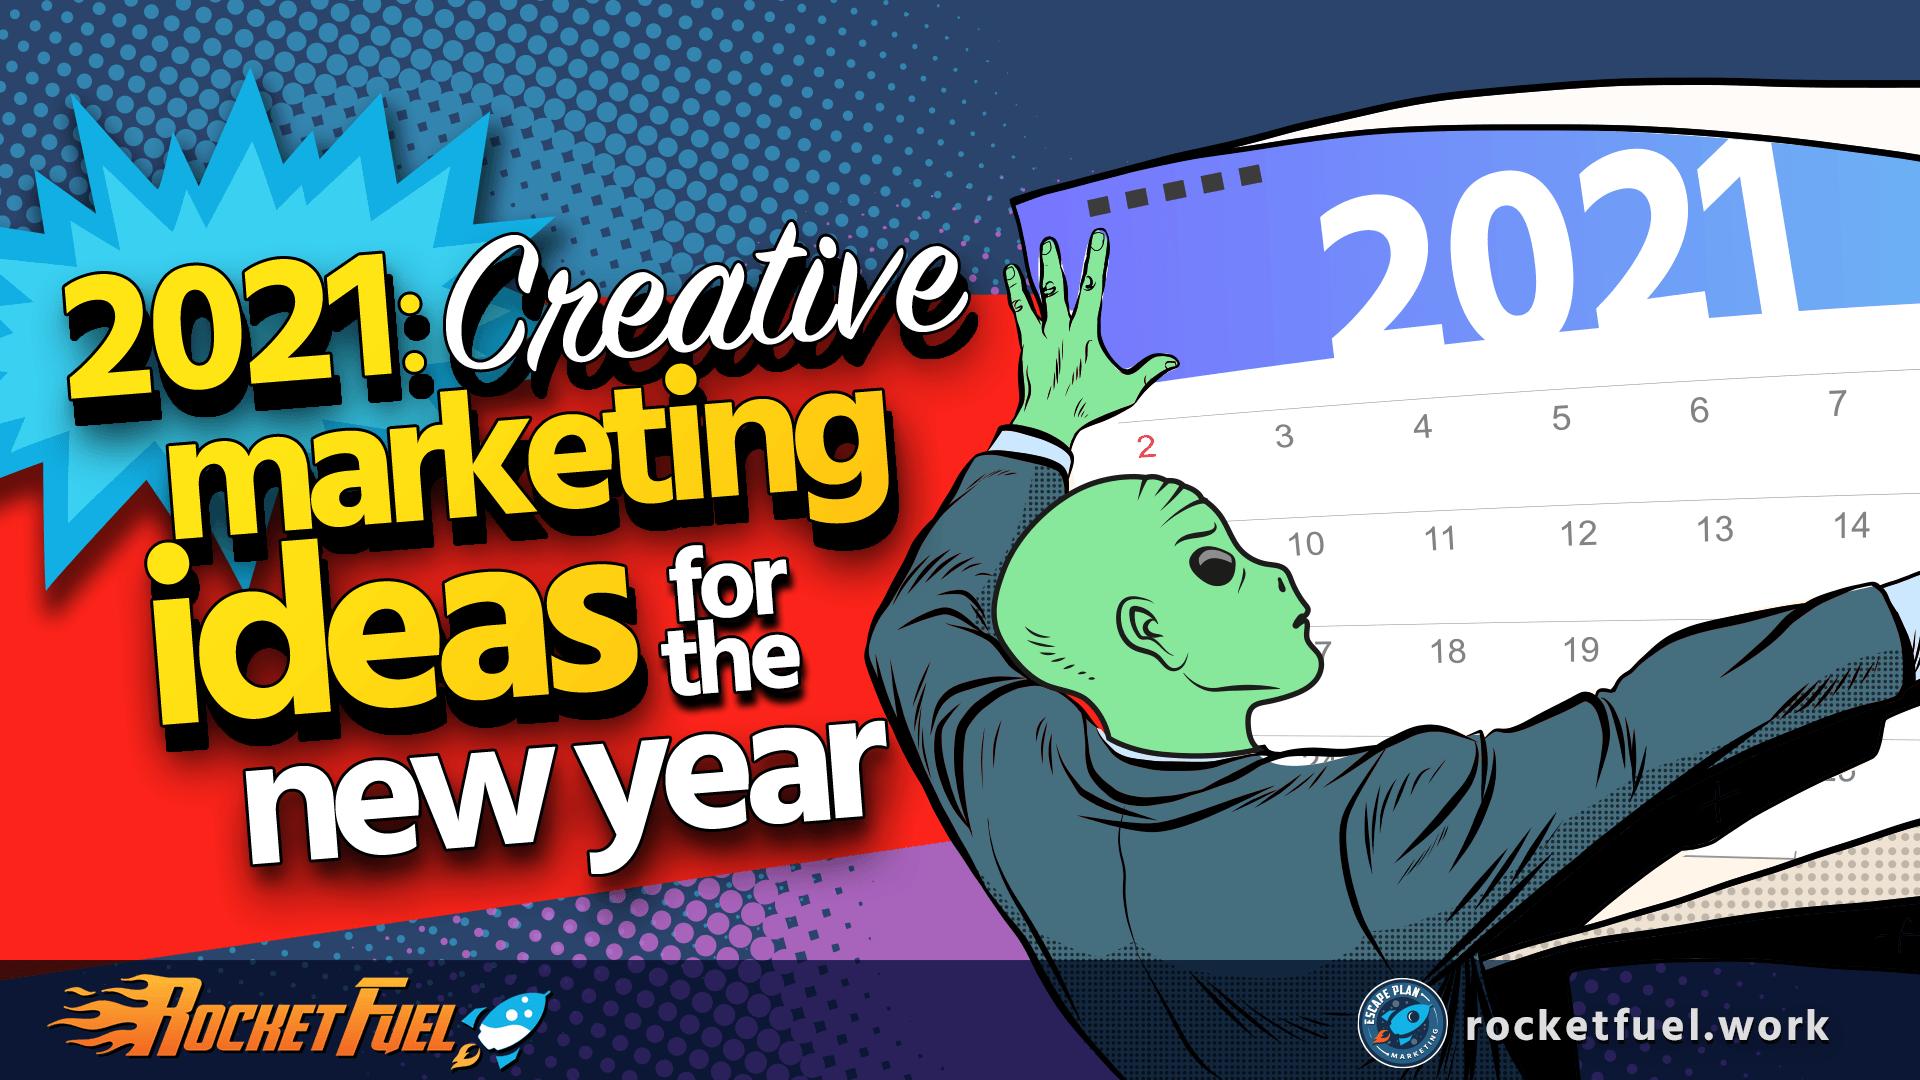 New Year's Marketing Ideas